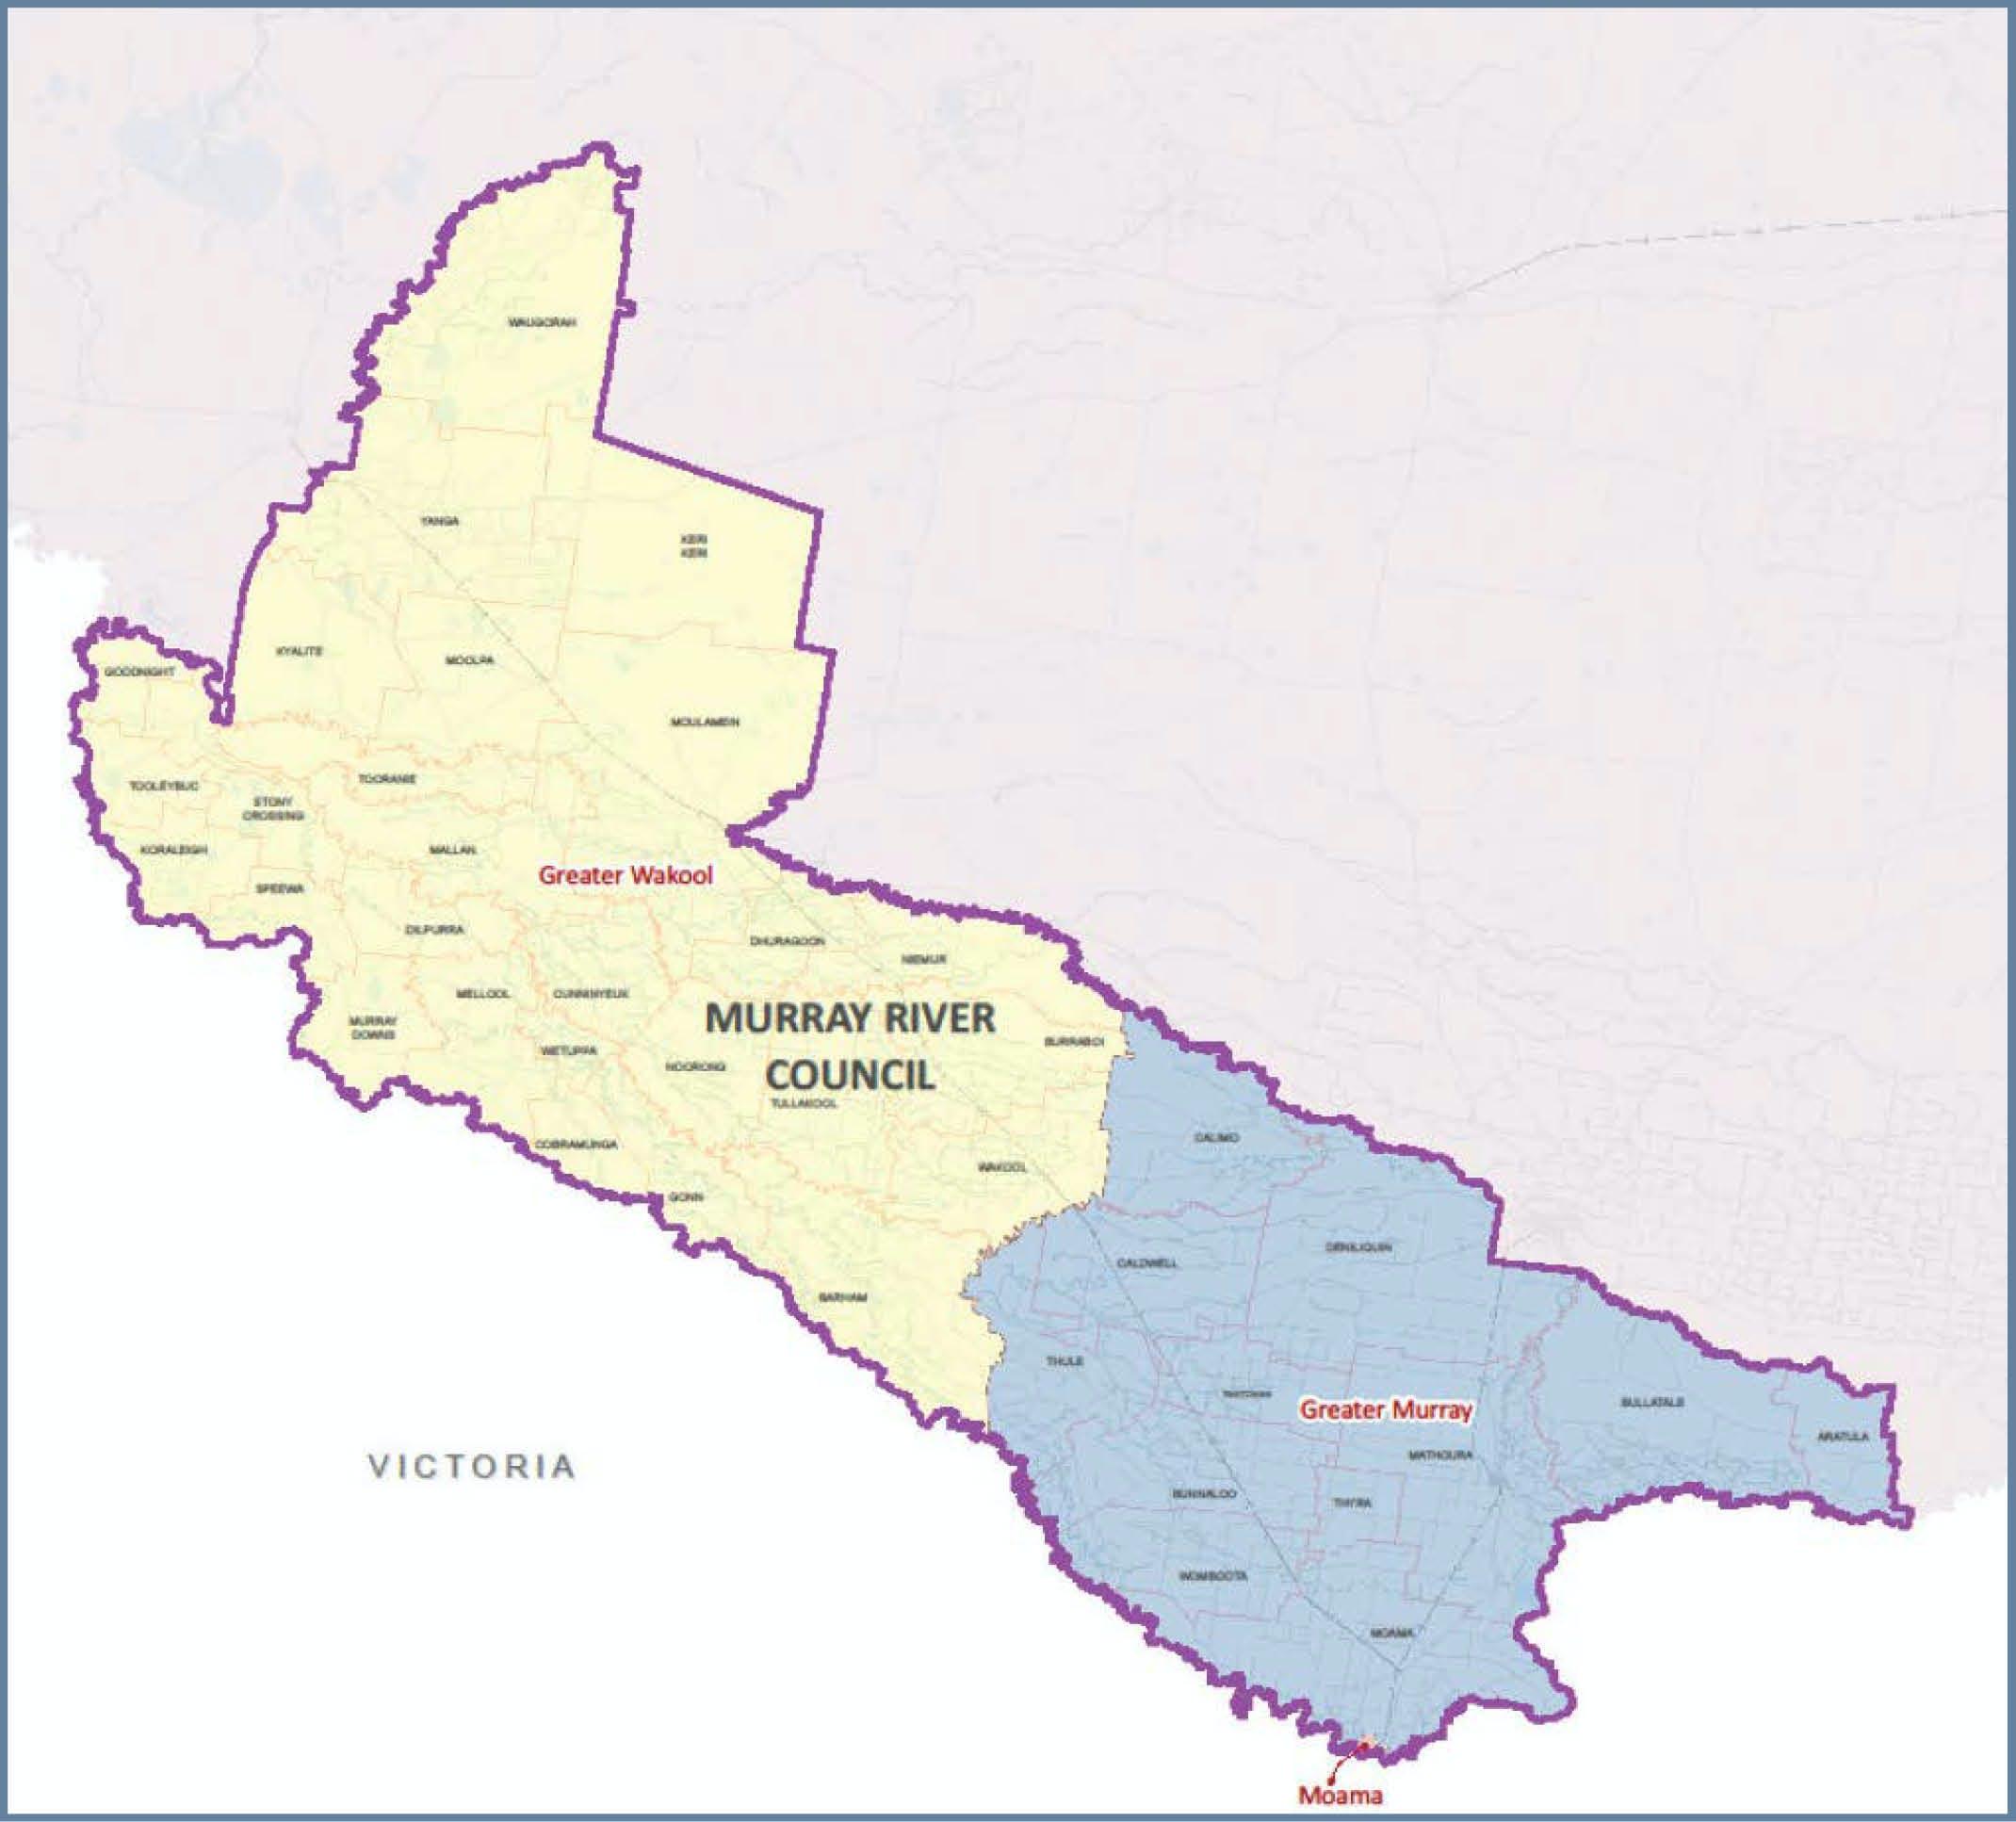 Map of Electoral Wards